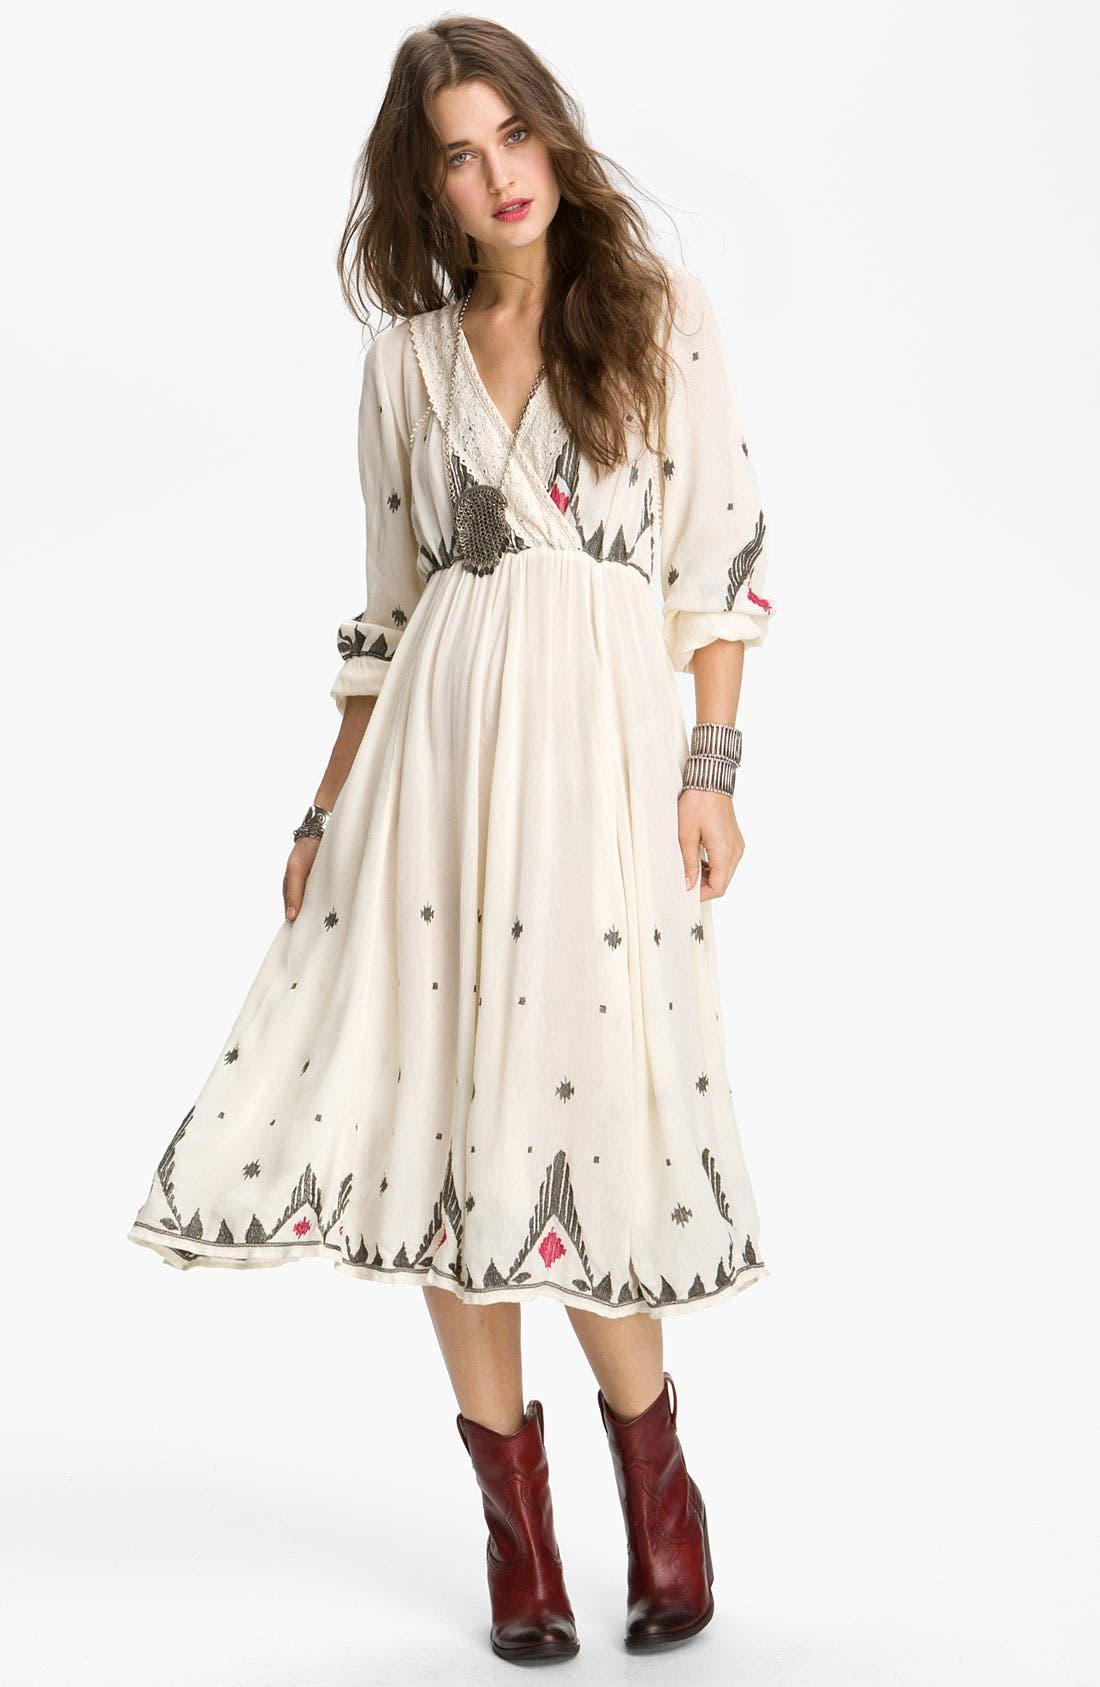 Alternate Image 1 Selected - Free People 'Splendor' Embroidered Peasant Dress